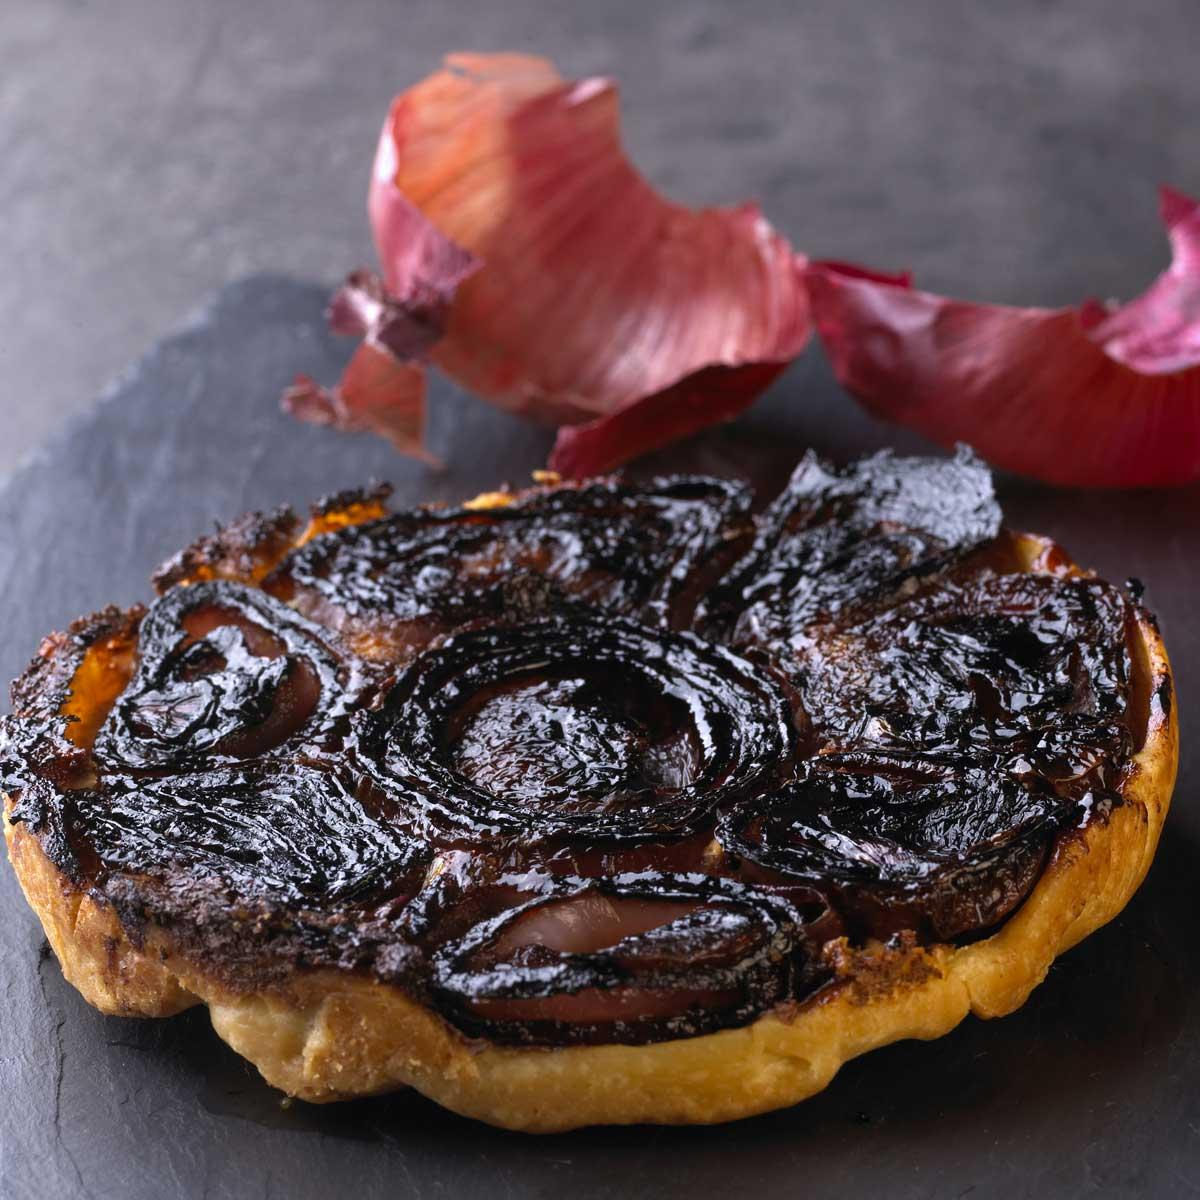 recette tatin d 39 oignons rouges cuisine madame figaro. Black Bedroom Furniture Sets. Home Design Ideas